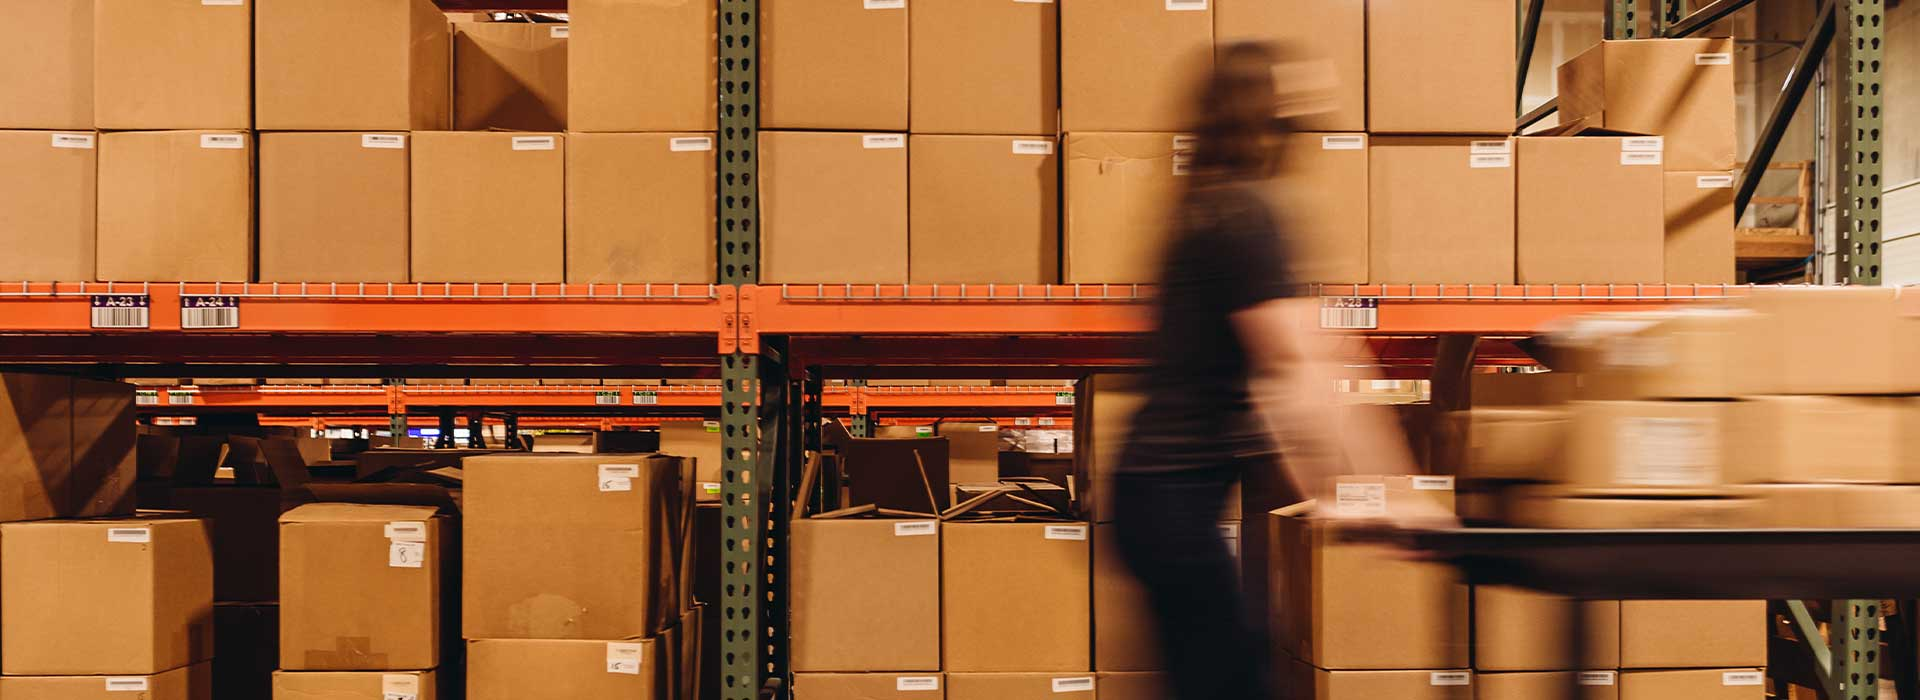 pushing_cart_through_warehouse_quickly